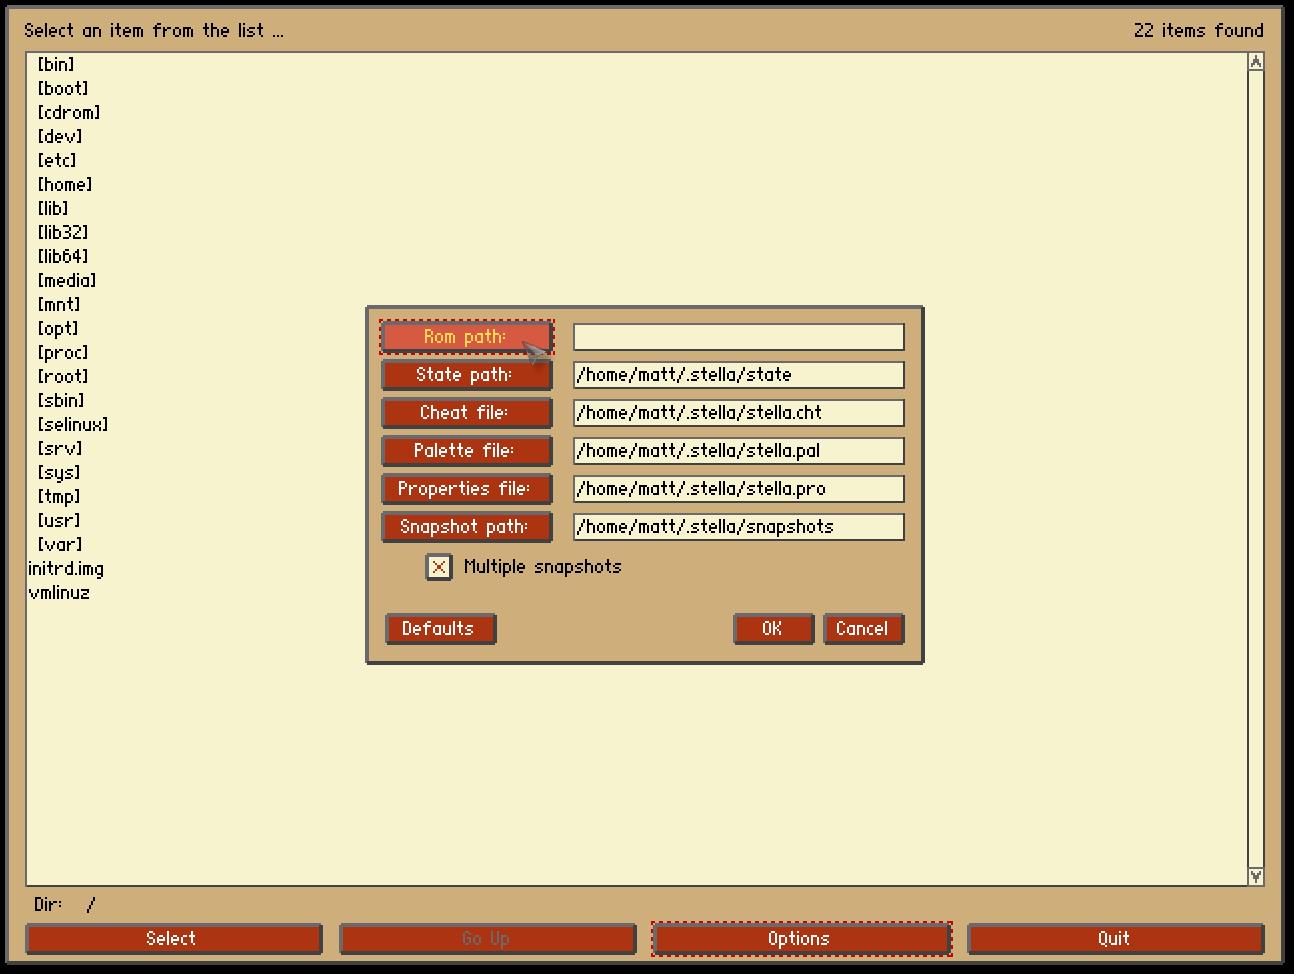 Rom path: button